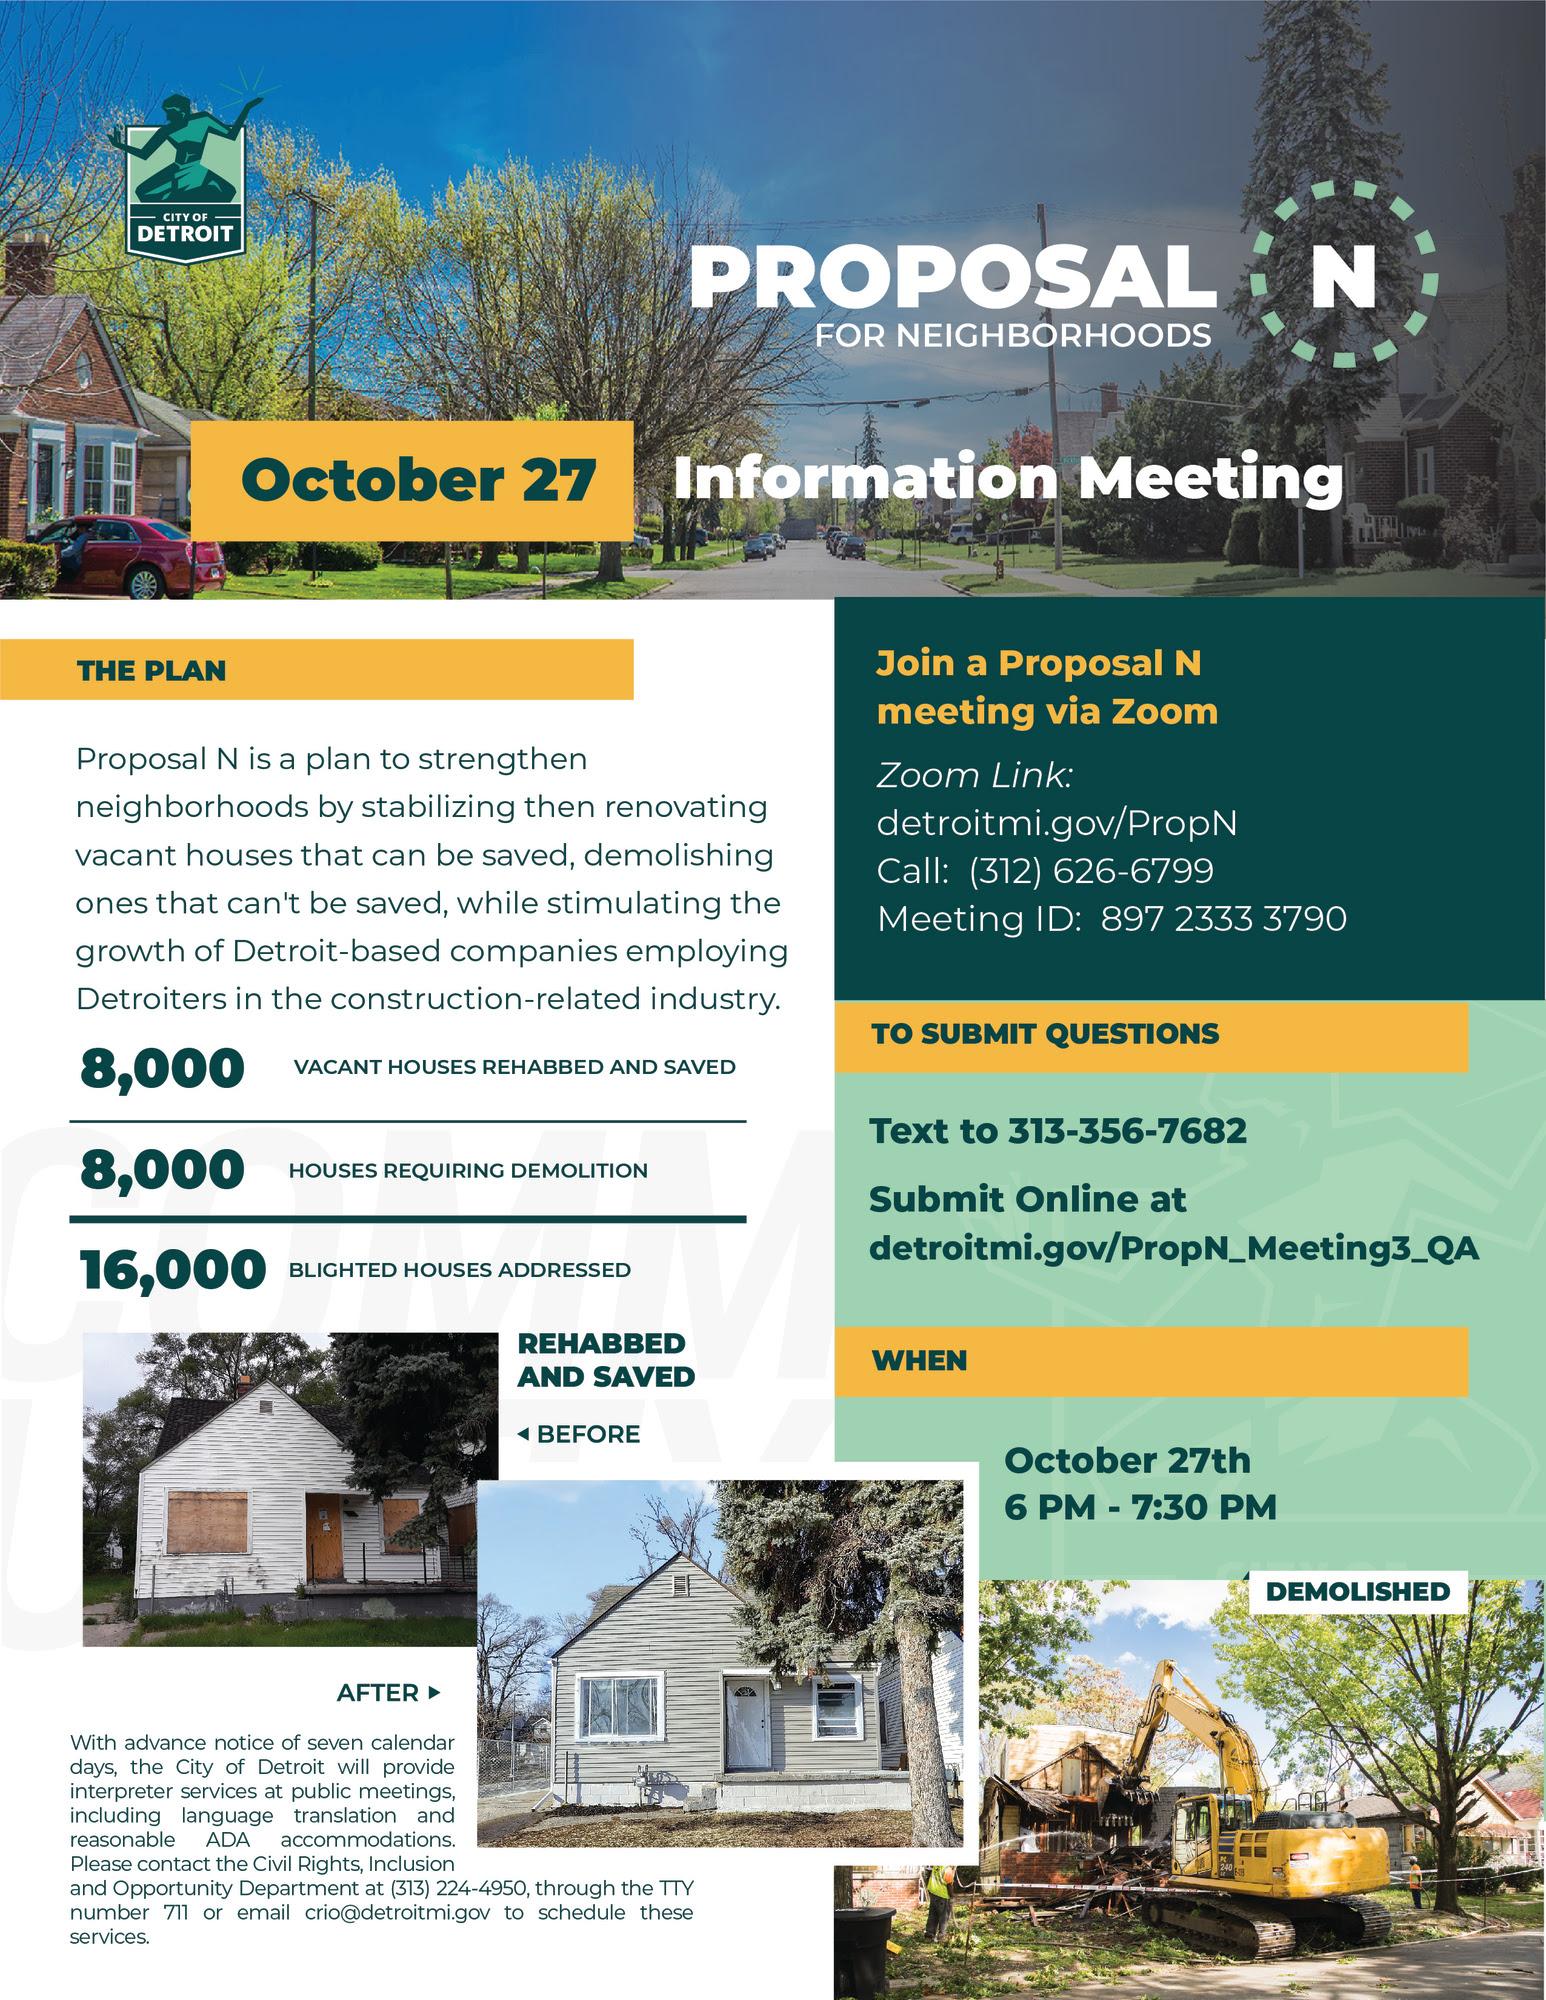 Proposal N Information Meeting Oct. 27